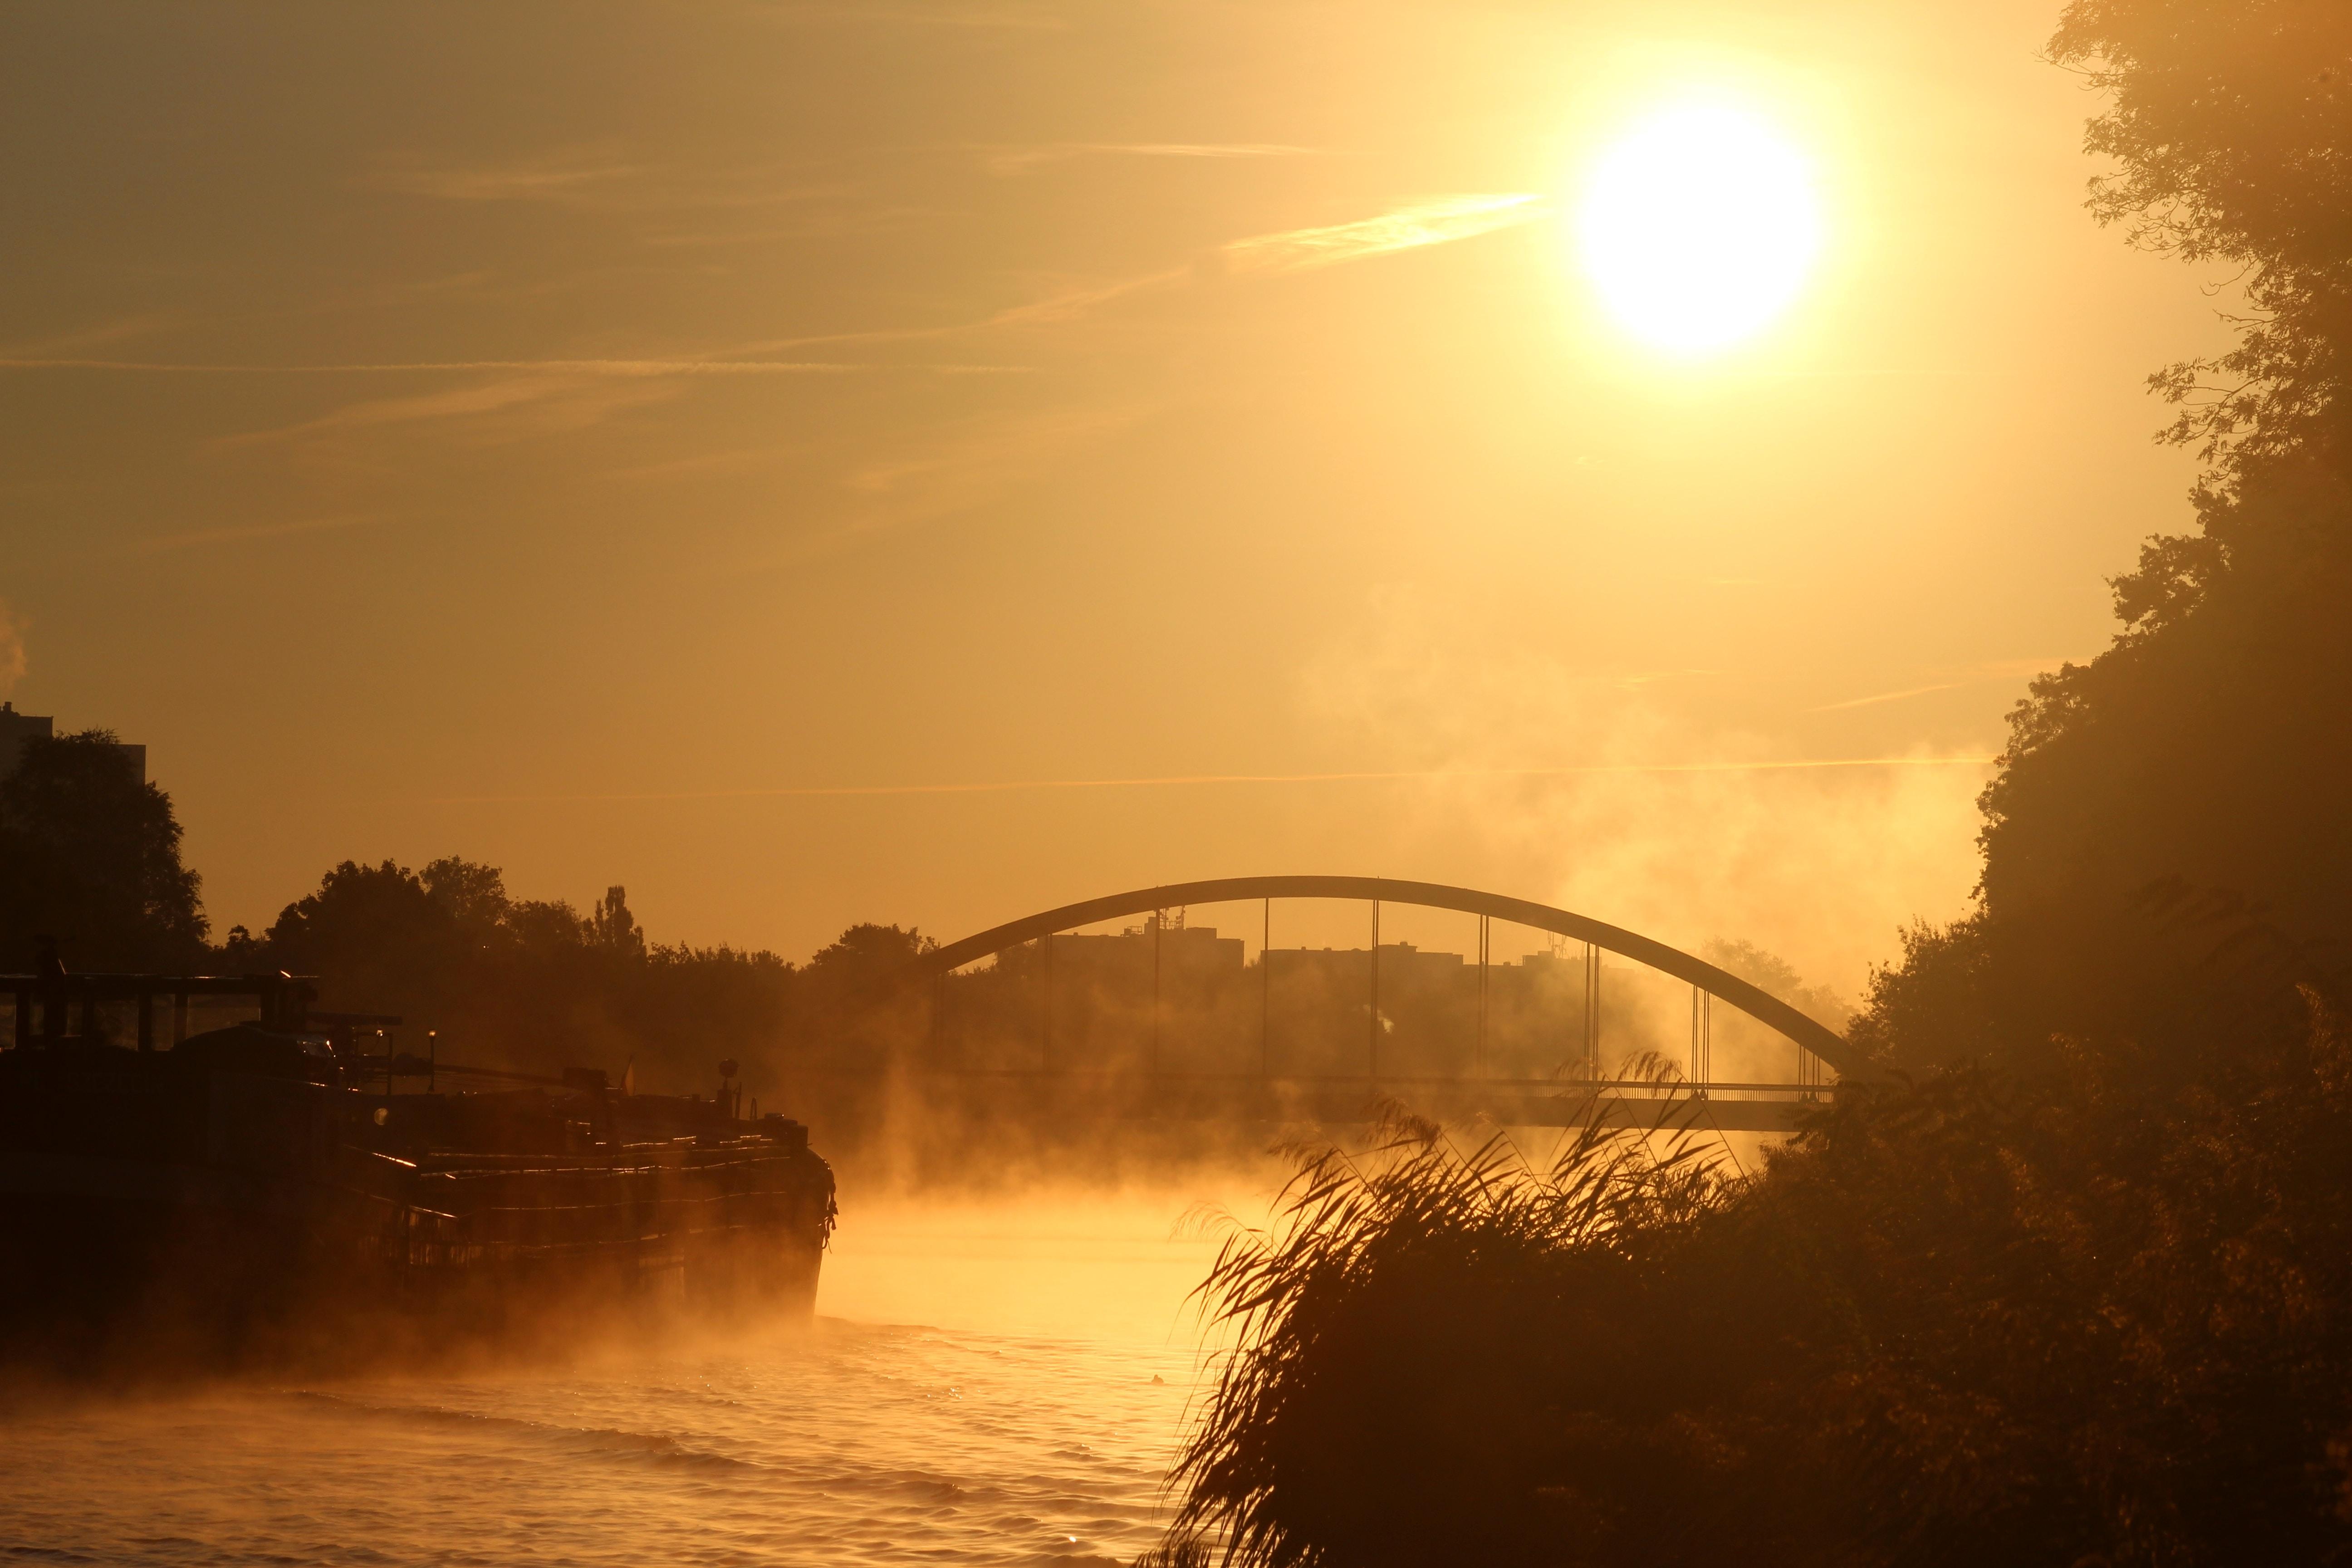 bridge across body of water